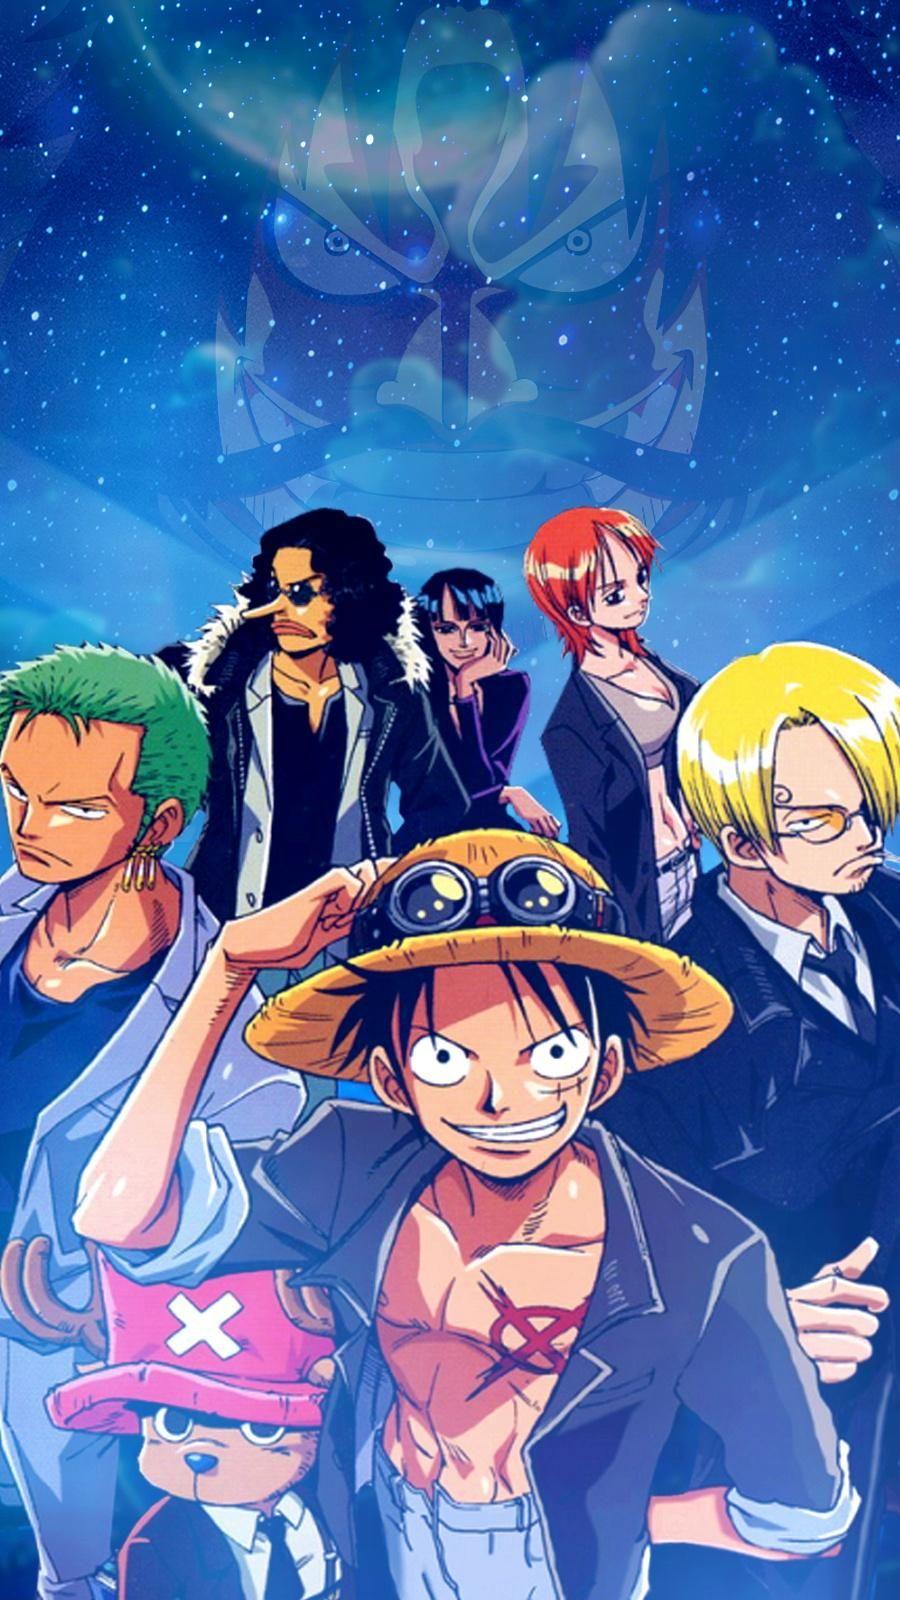 The wallpaper trend is going strong. One Piece Mobile Wallpaper Reddit Bakaninime In 2021 Mobile Wallpaper Popular Anime Anime